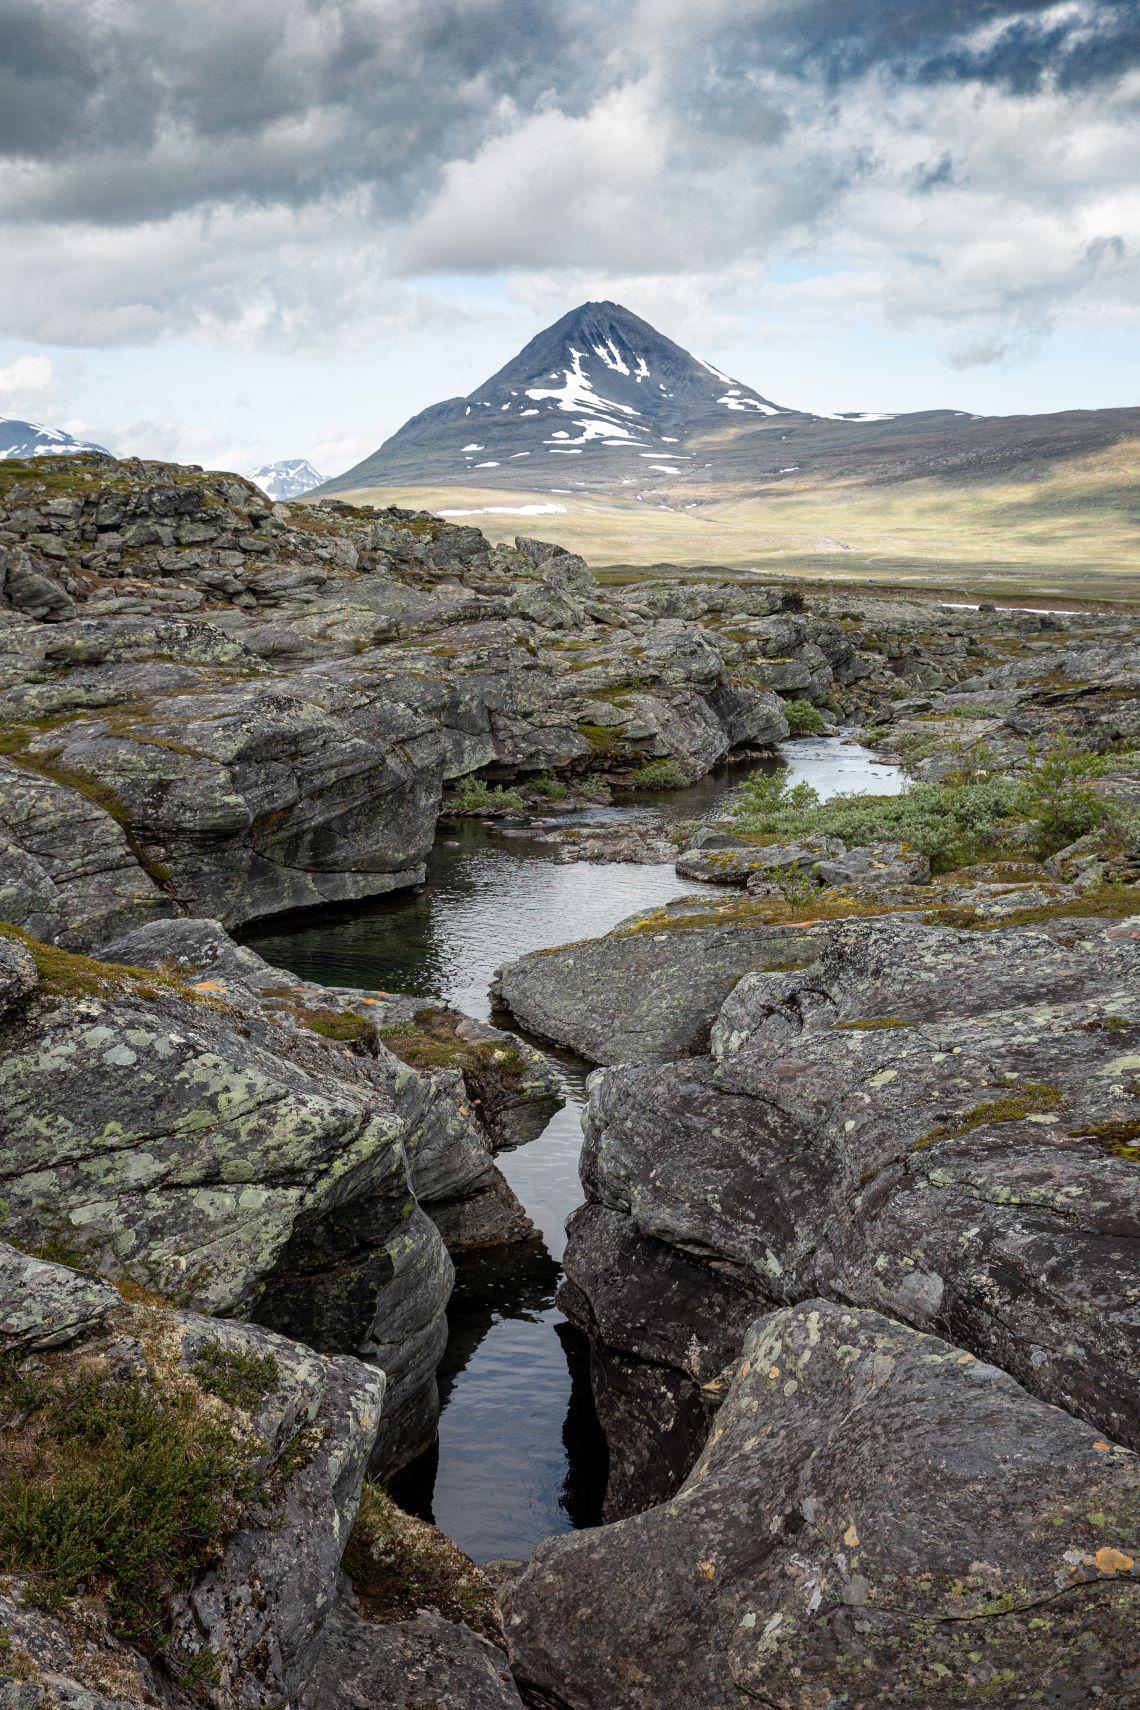 Scandinavia-Swedish-Norwegian-border-mountains